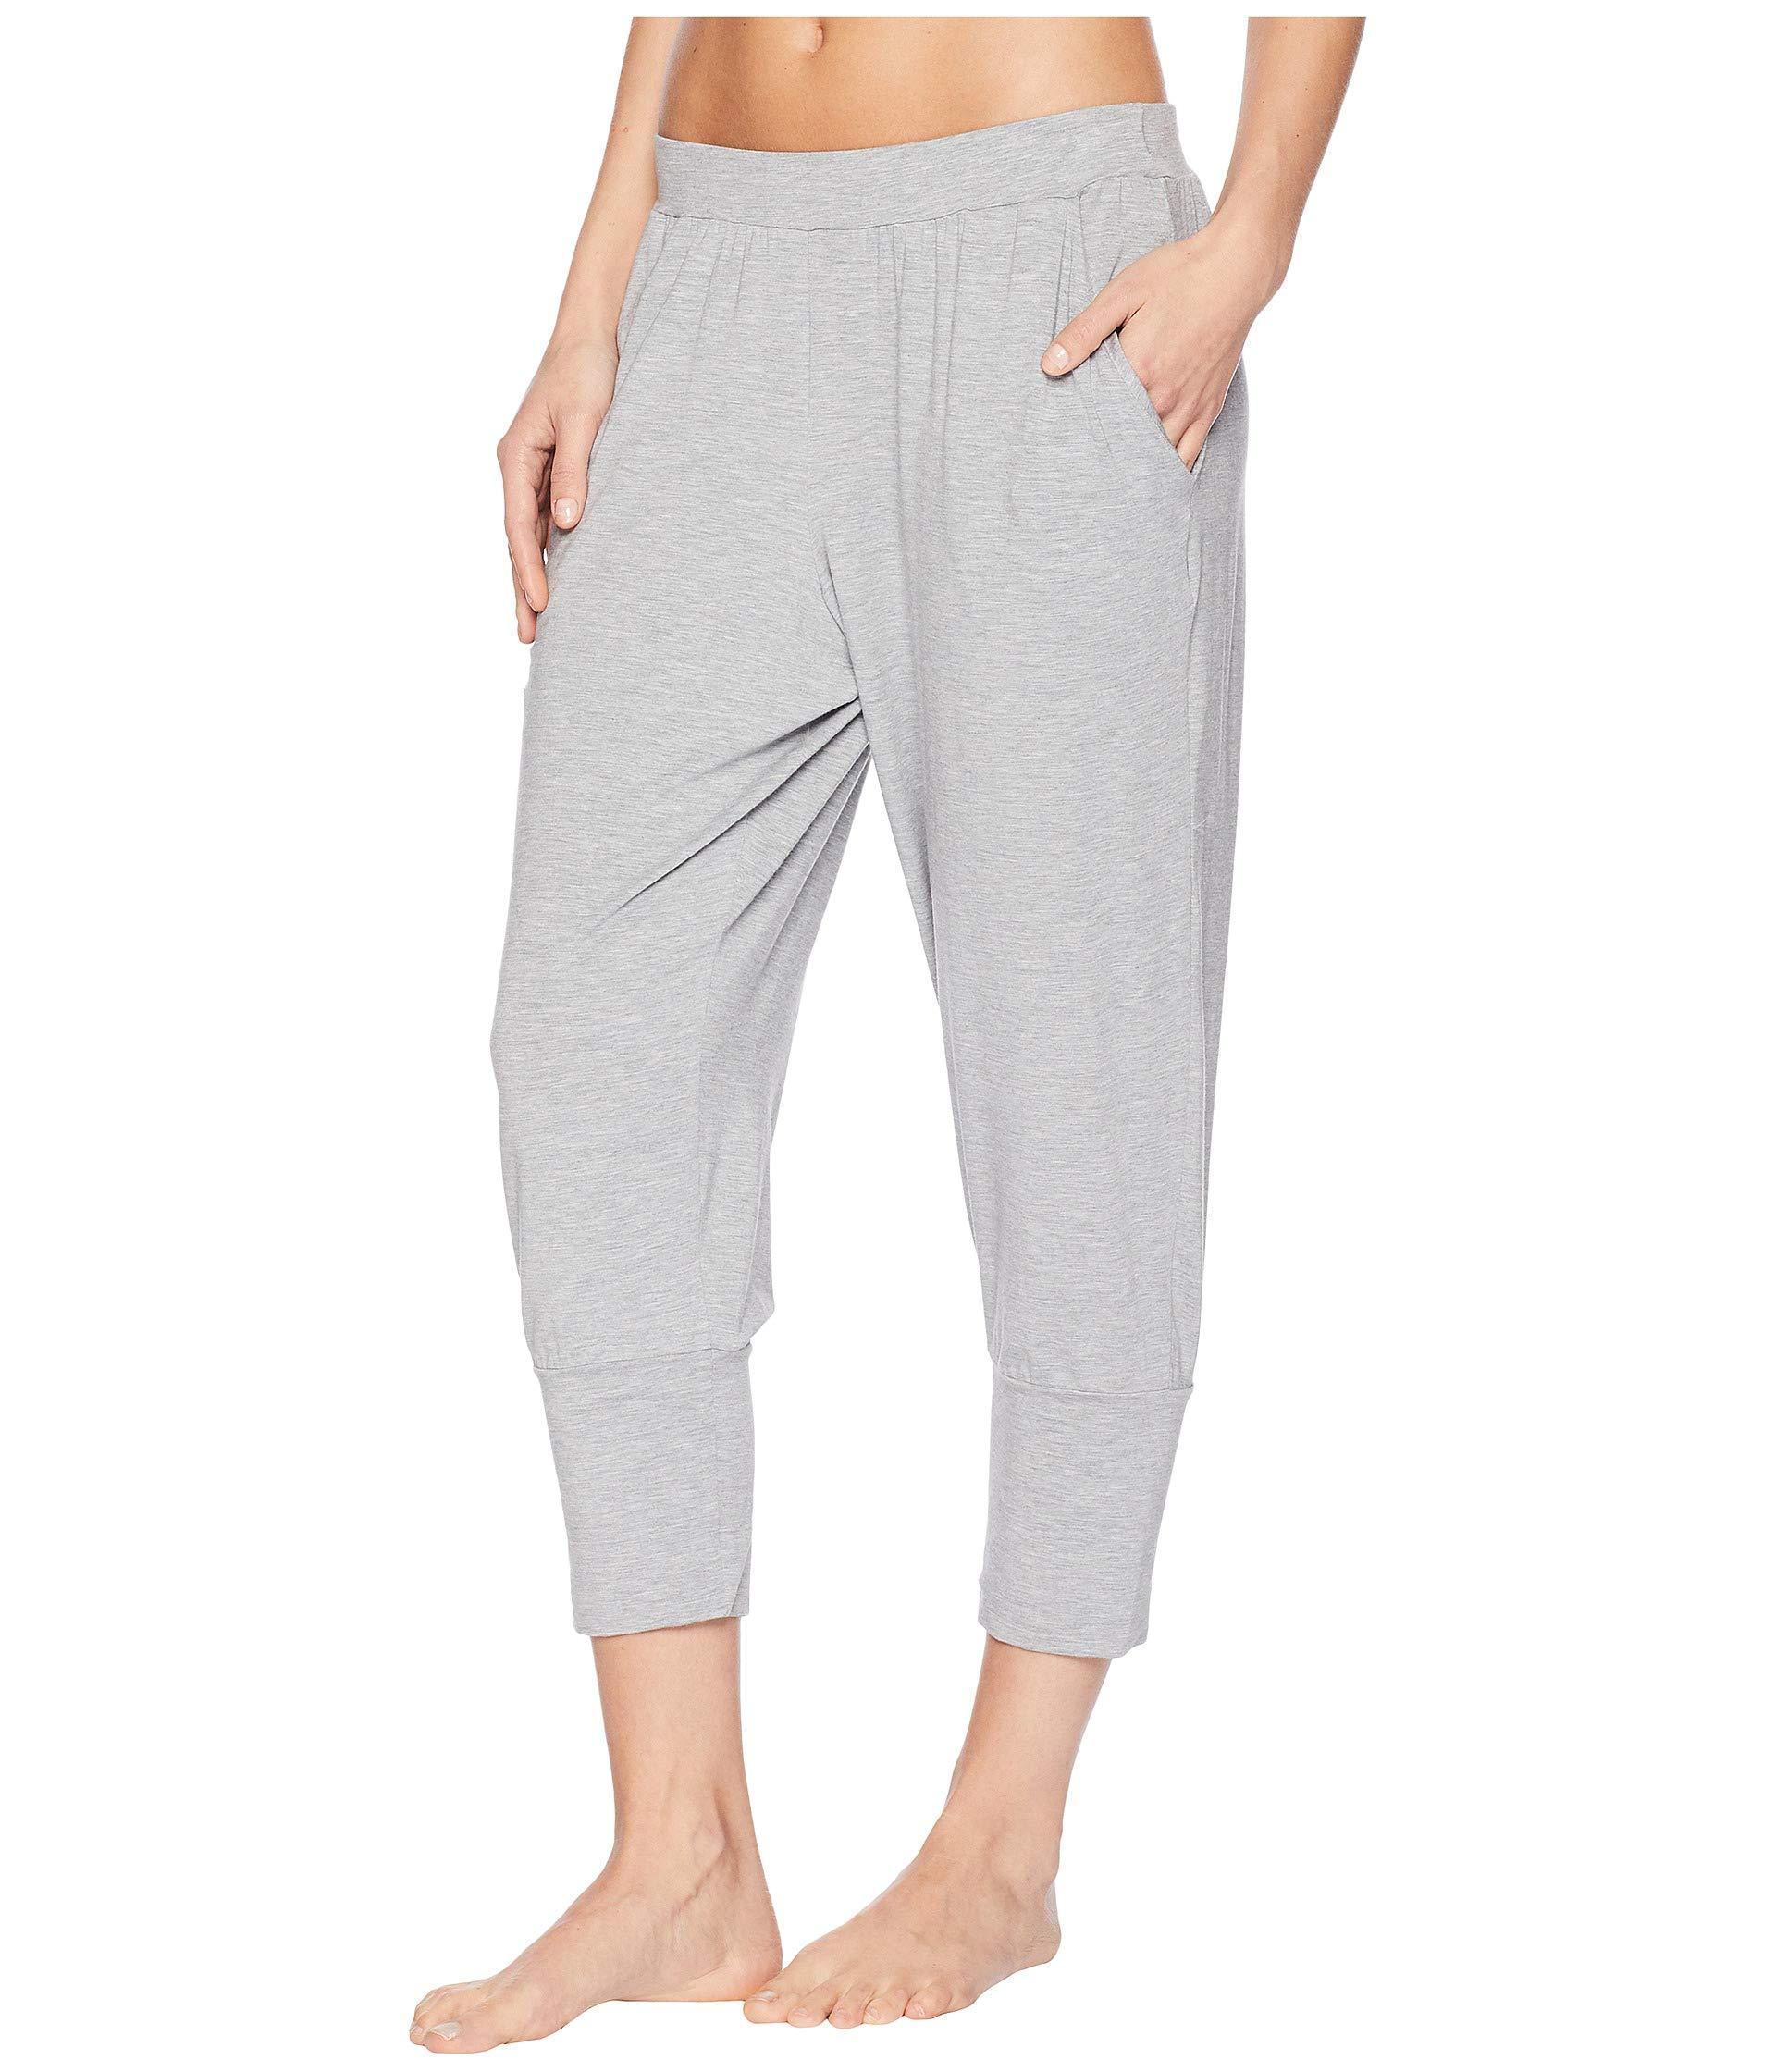 00a2604bc762b Lyst - Hanro Yoga Crop Pants in Gray